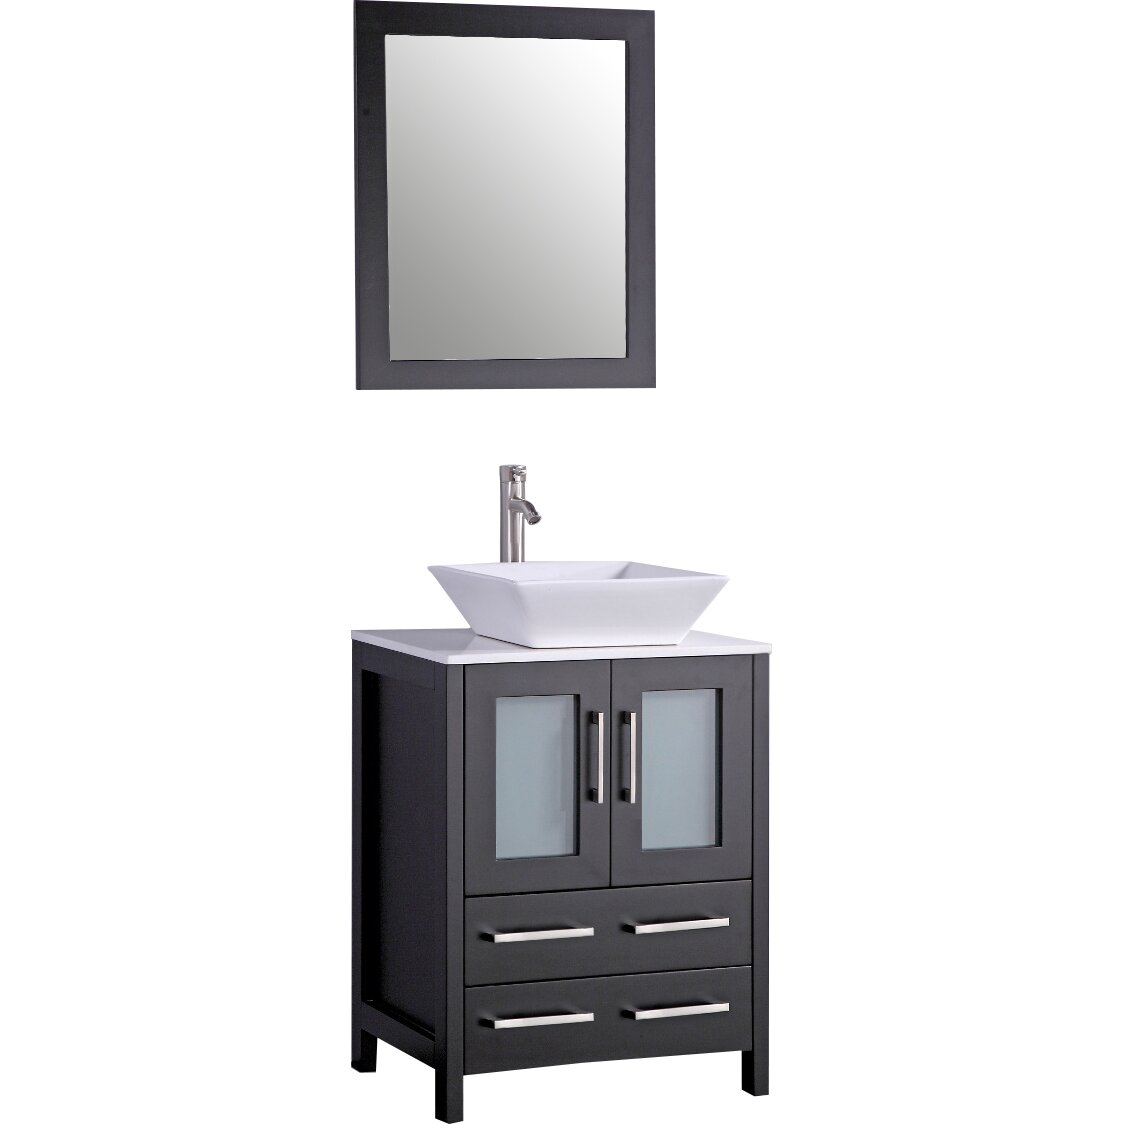 Legion furniture 24 single bathroom vanity set with for Furniture 24